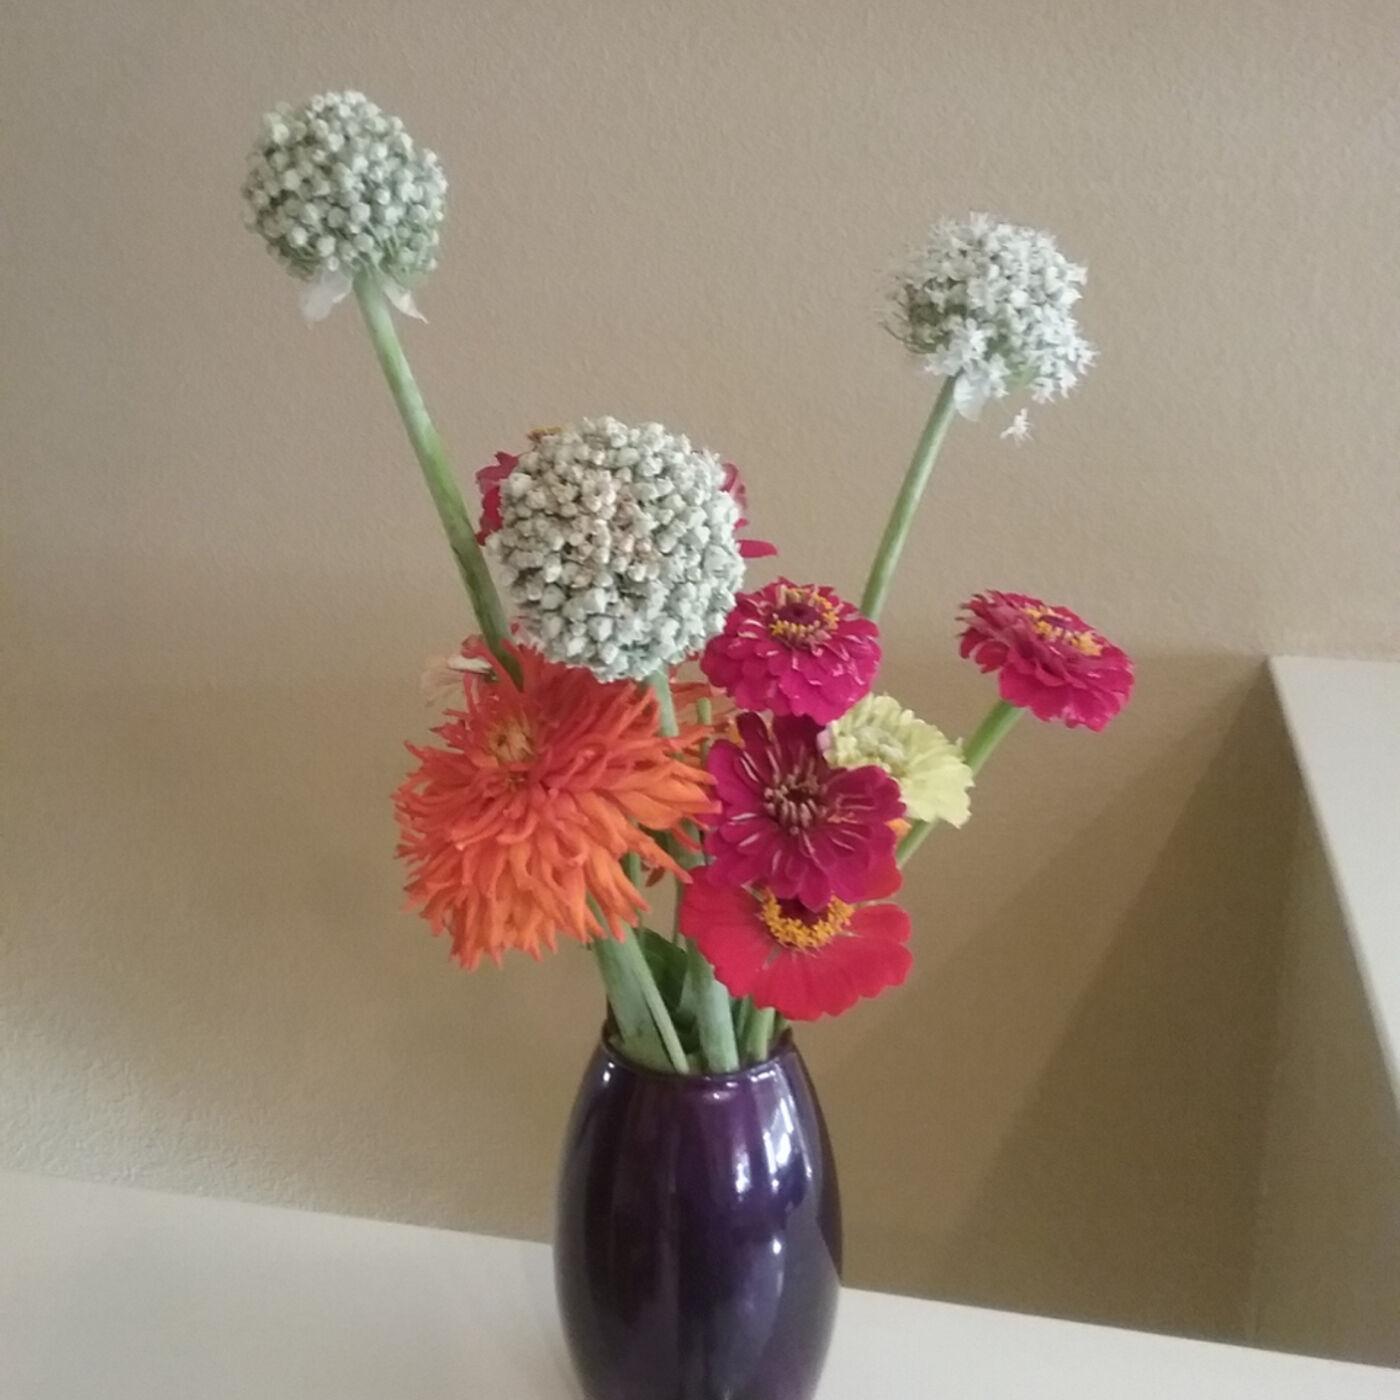 052 Cut Flower Basics. Winter Chicken Care.